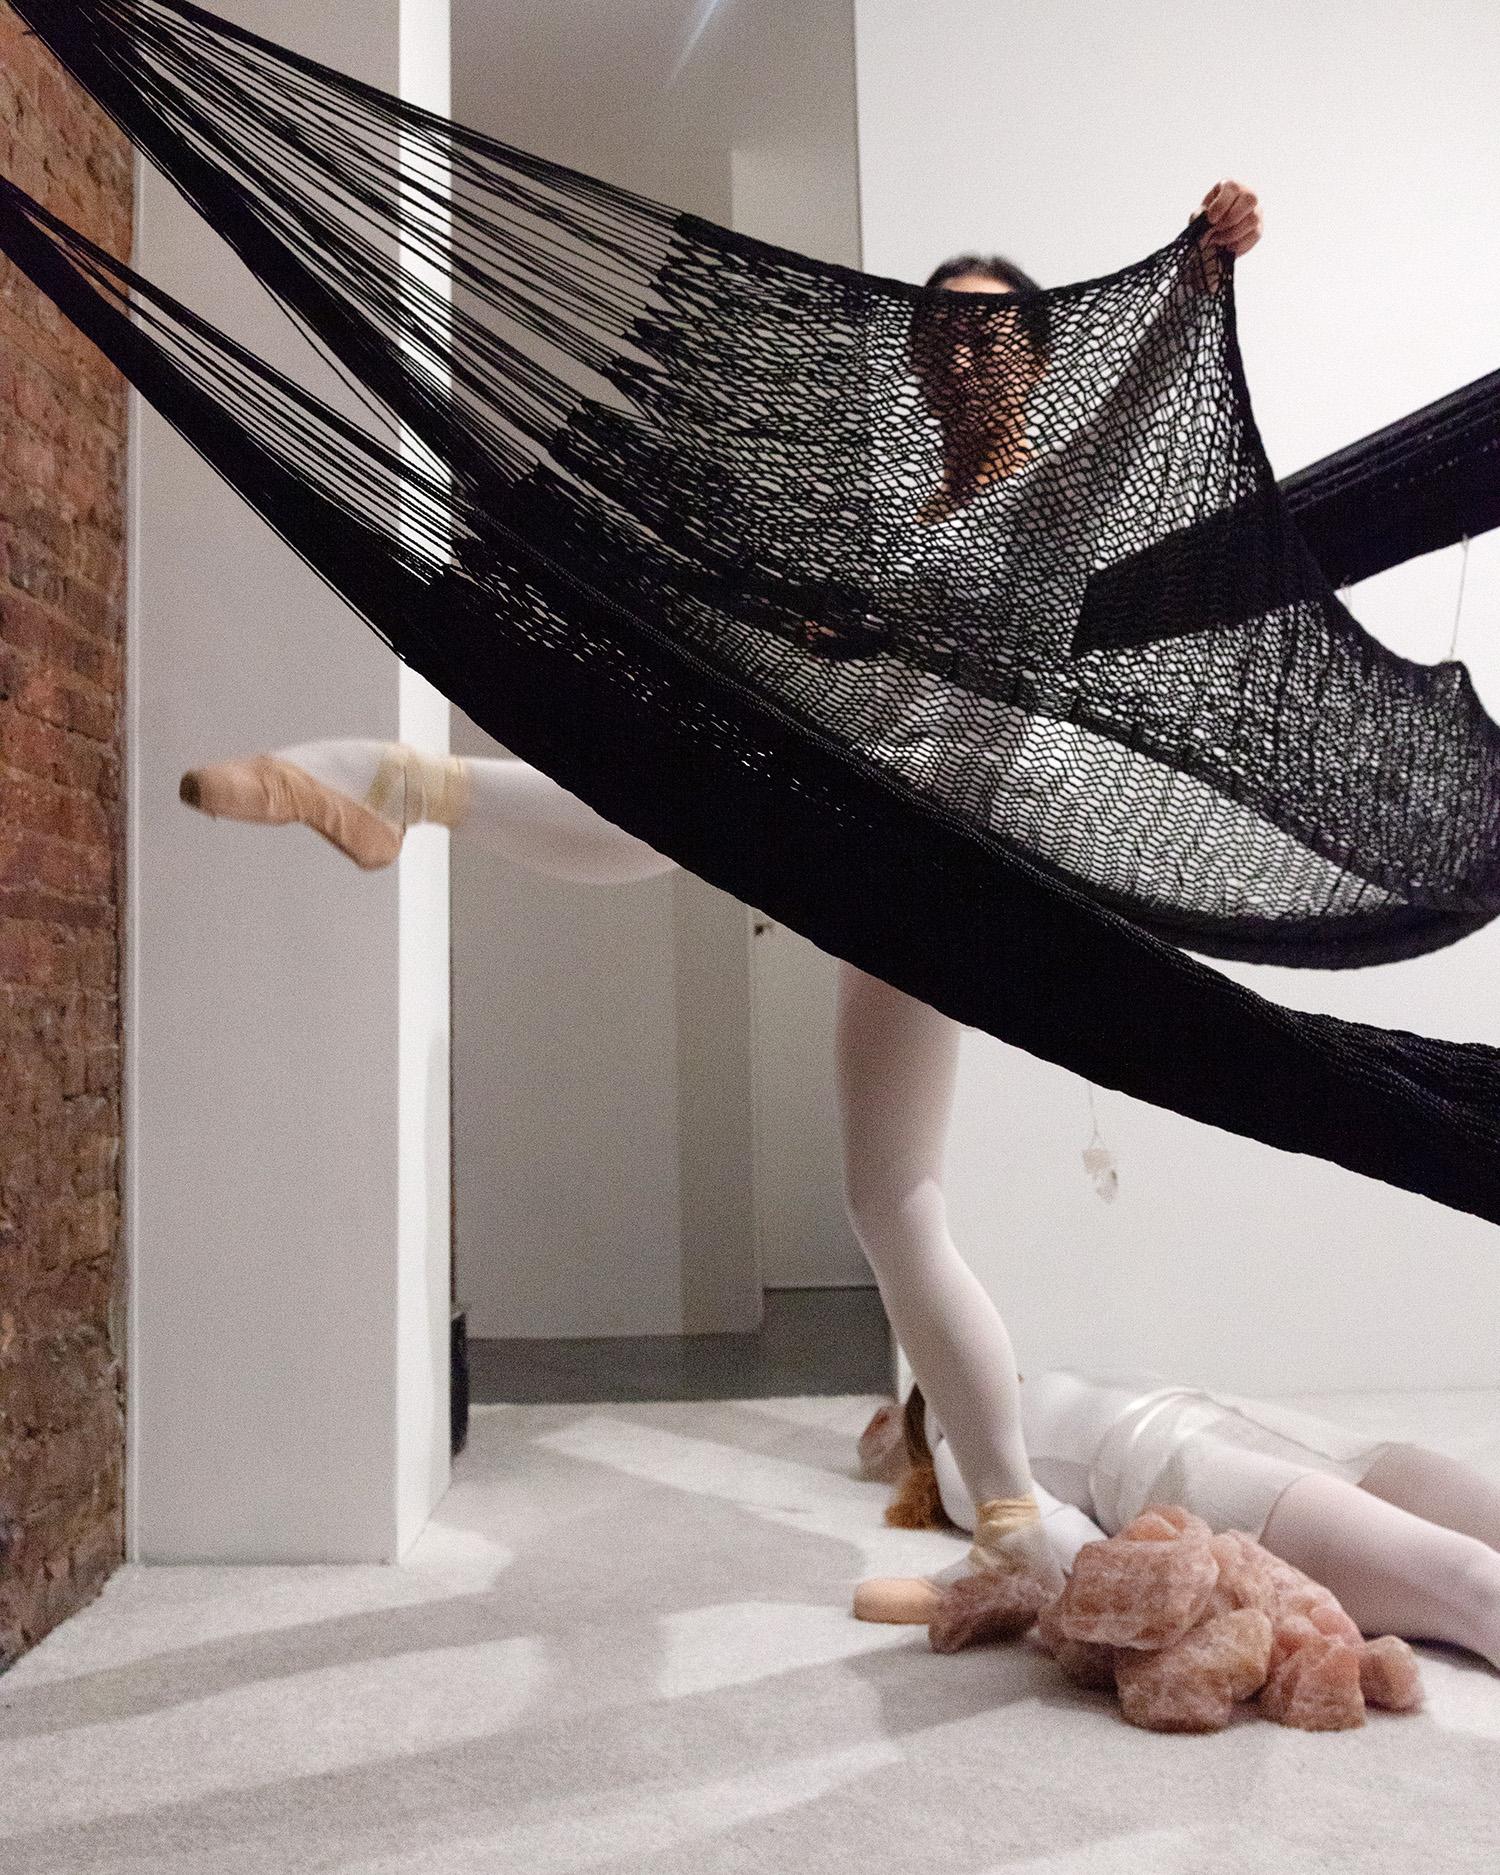 Jen DeNike,  Crystal Cut Levitation , performance at signs and symbols, January 31, 2019